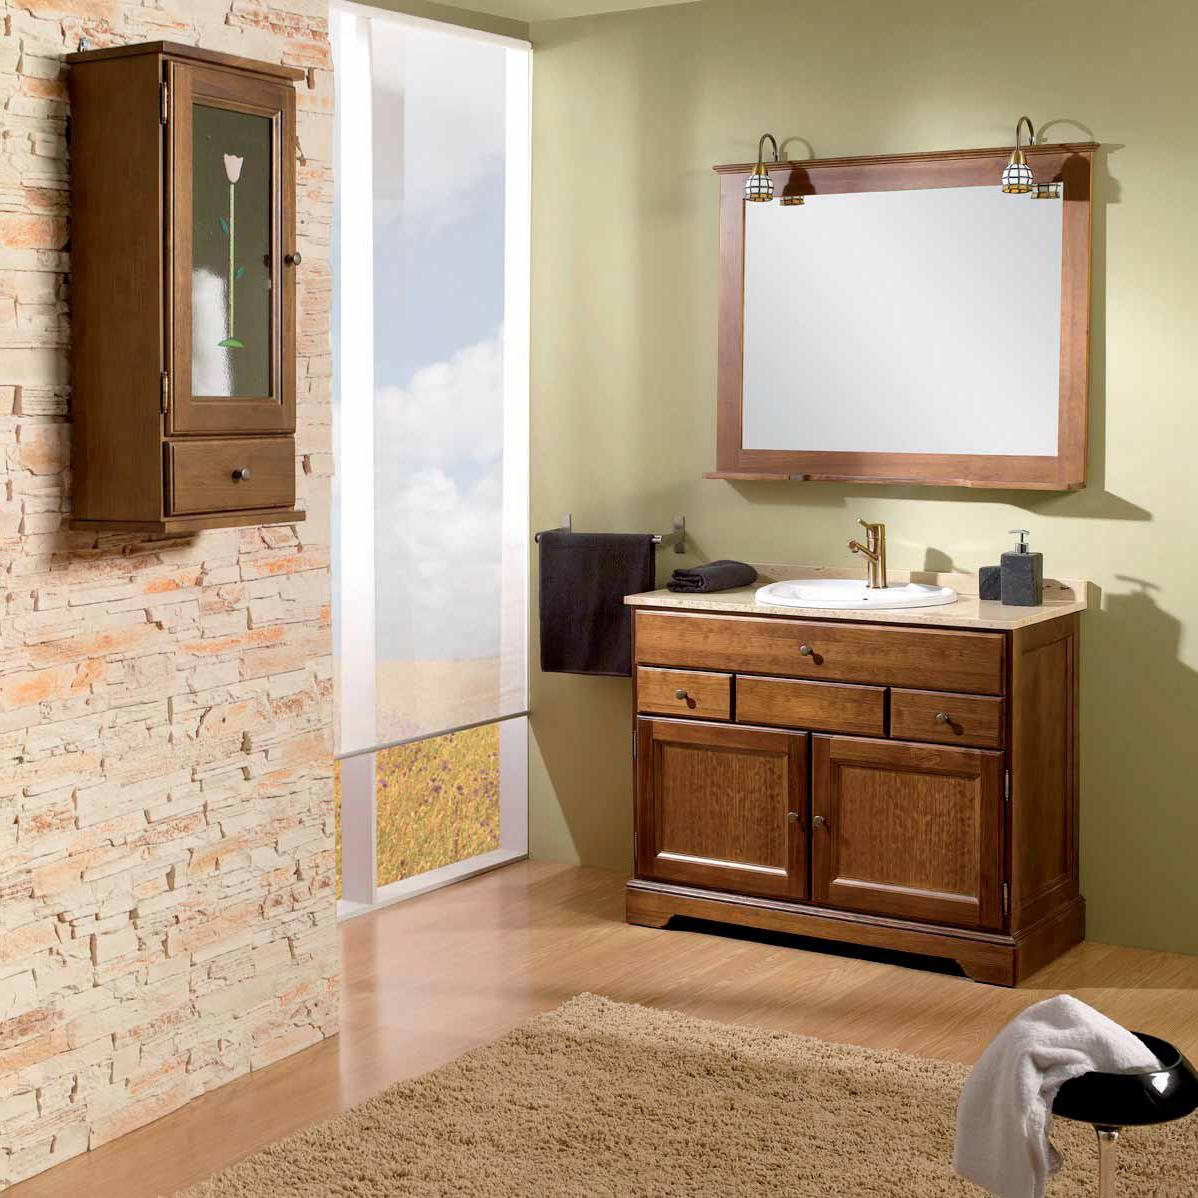 Rustic Bathroom Design On a Budget